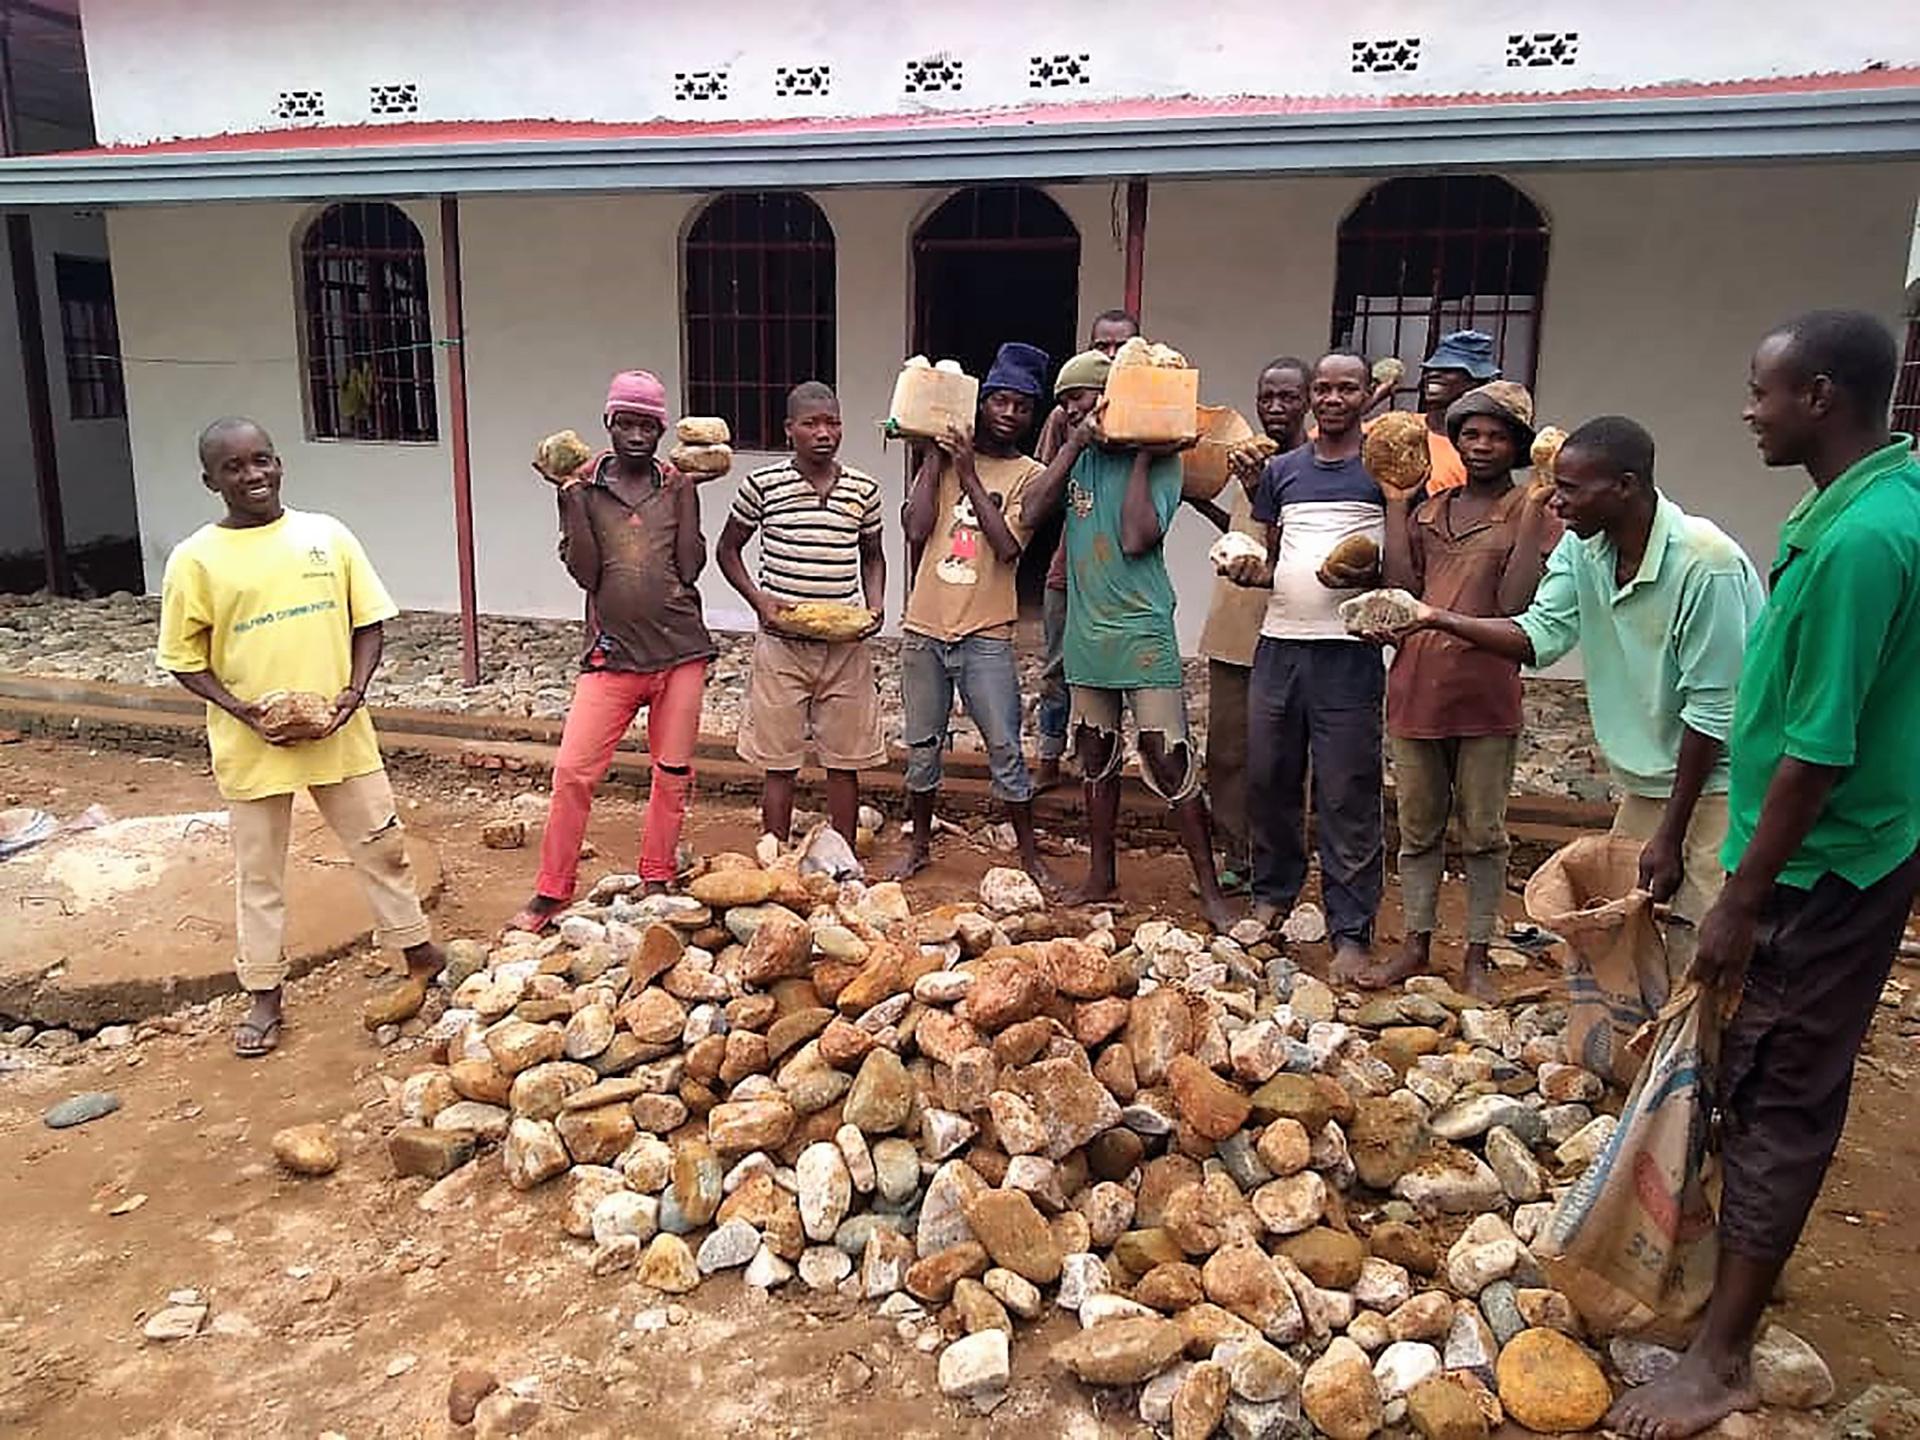 Mobiele school handel- vakopleiding Burundi